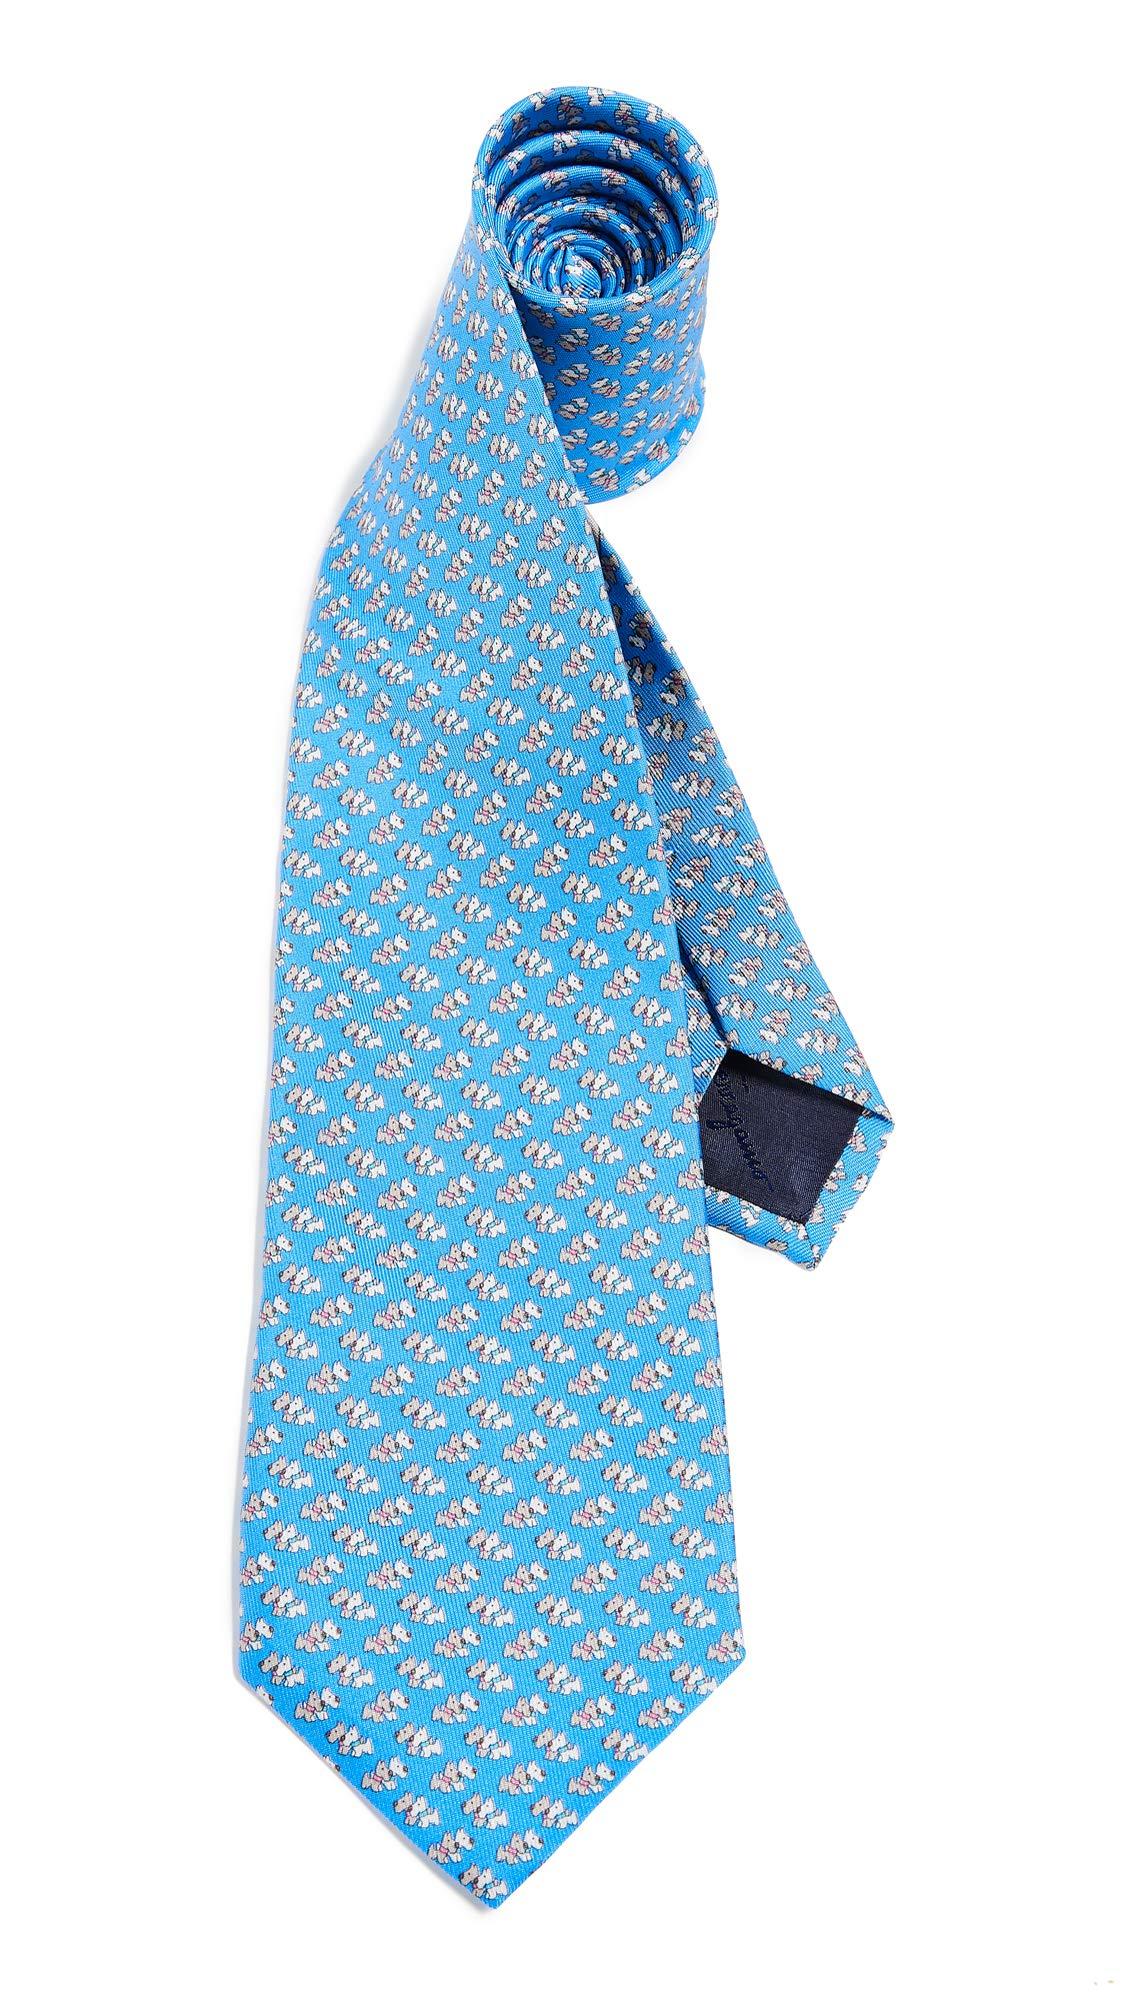 Salvatore Ferragamo Men's Dog Tie, Blue, One Size